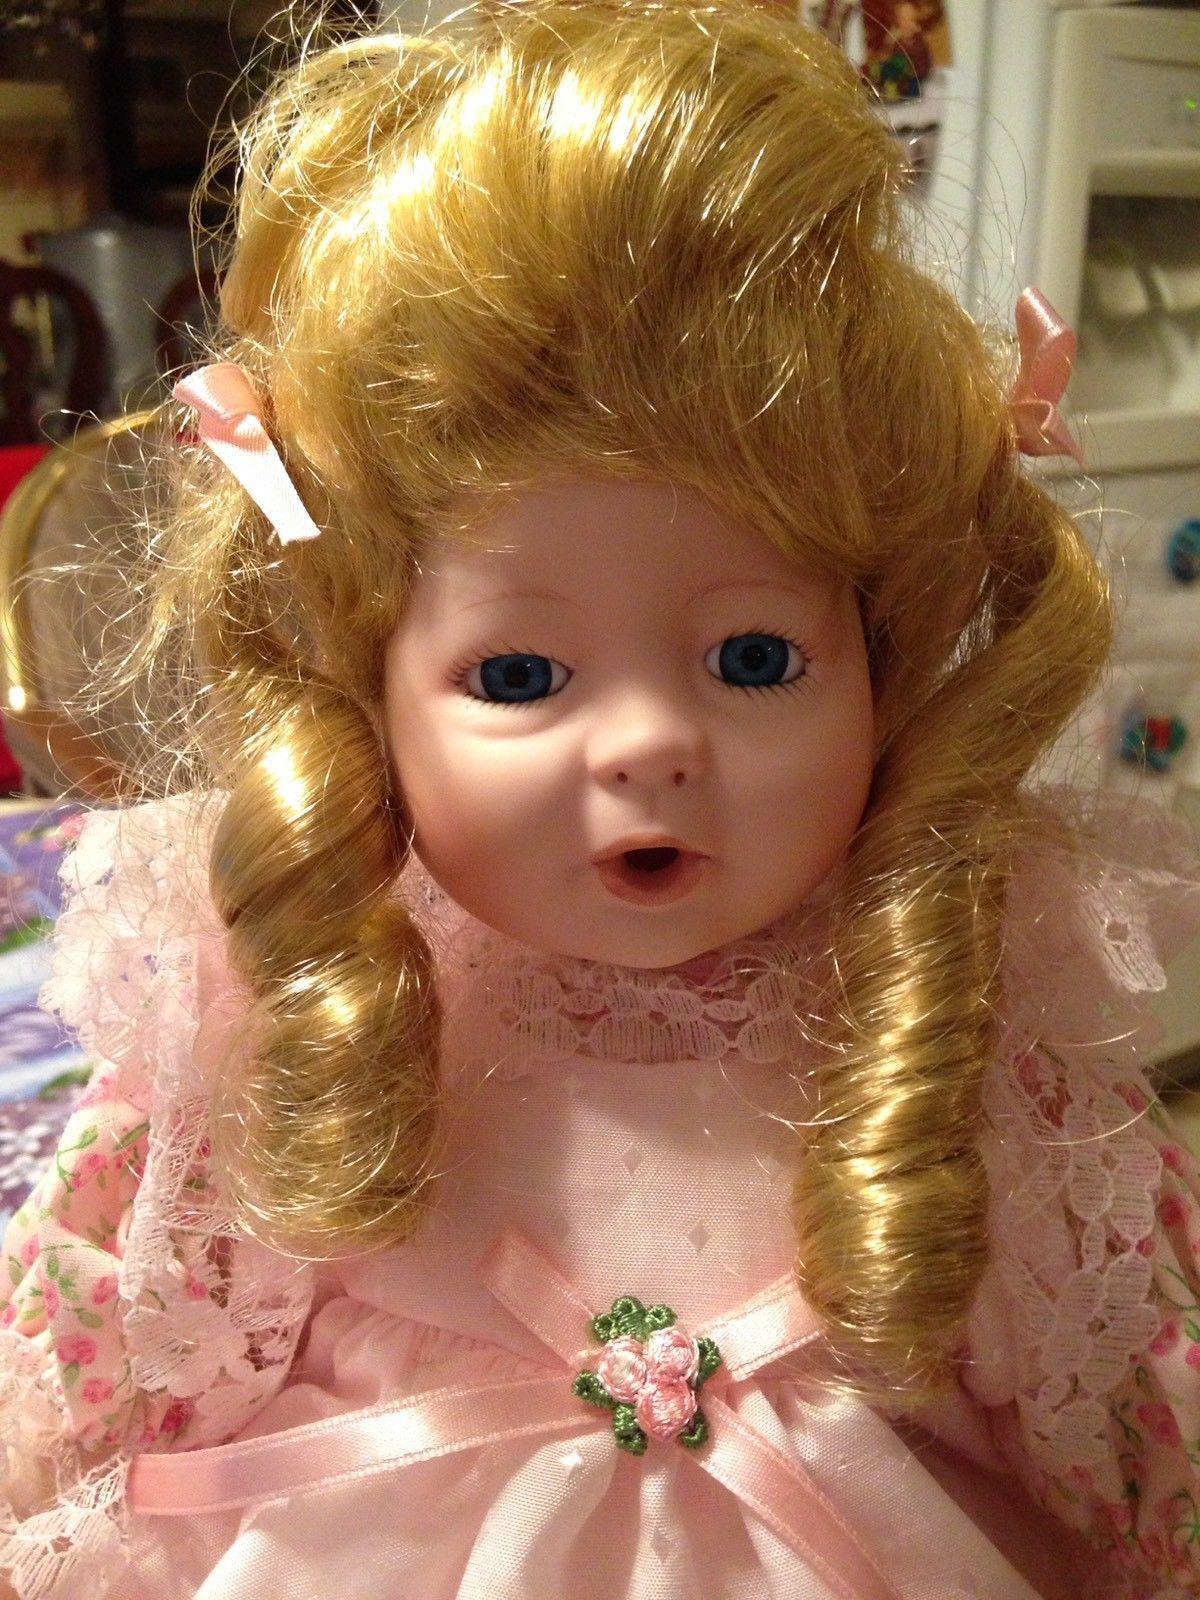 1992 JC Penney Exclusive Vintage Victorian Pink Floral Dress Porcelain Doll New